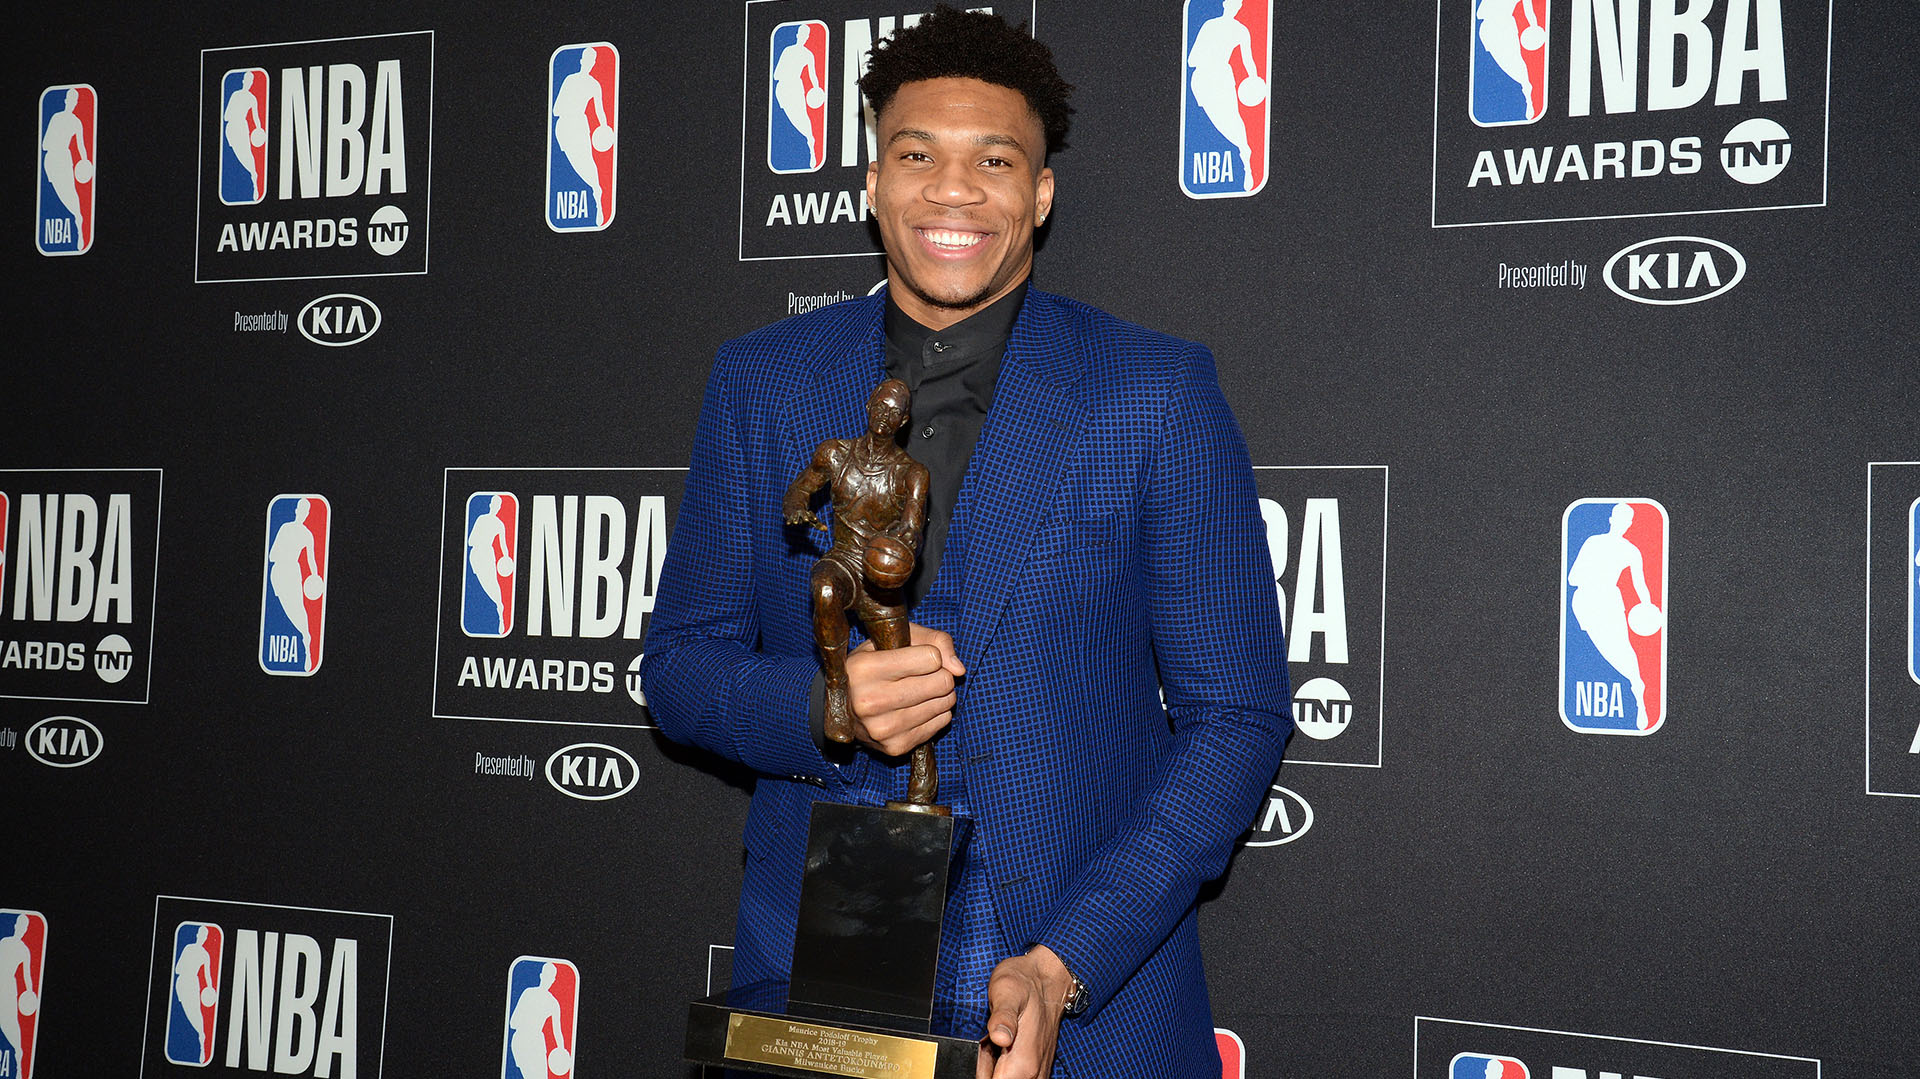 De vendedor ambulante e inmigrante ilegal a MVP de la NBA: el emotivo  discurso de Giannis Antetokounmpo - Infobae